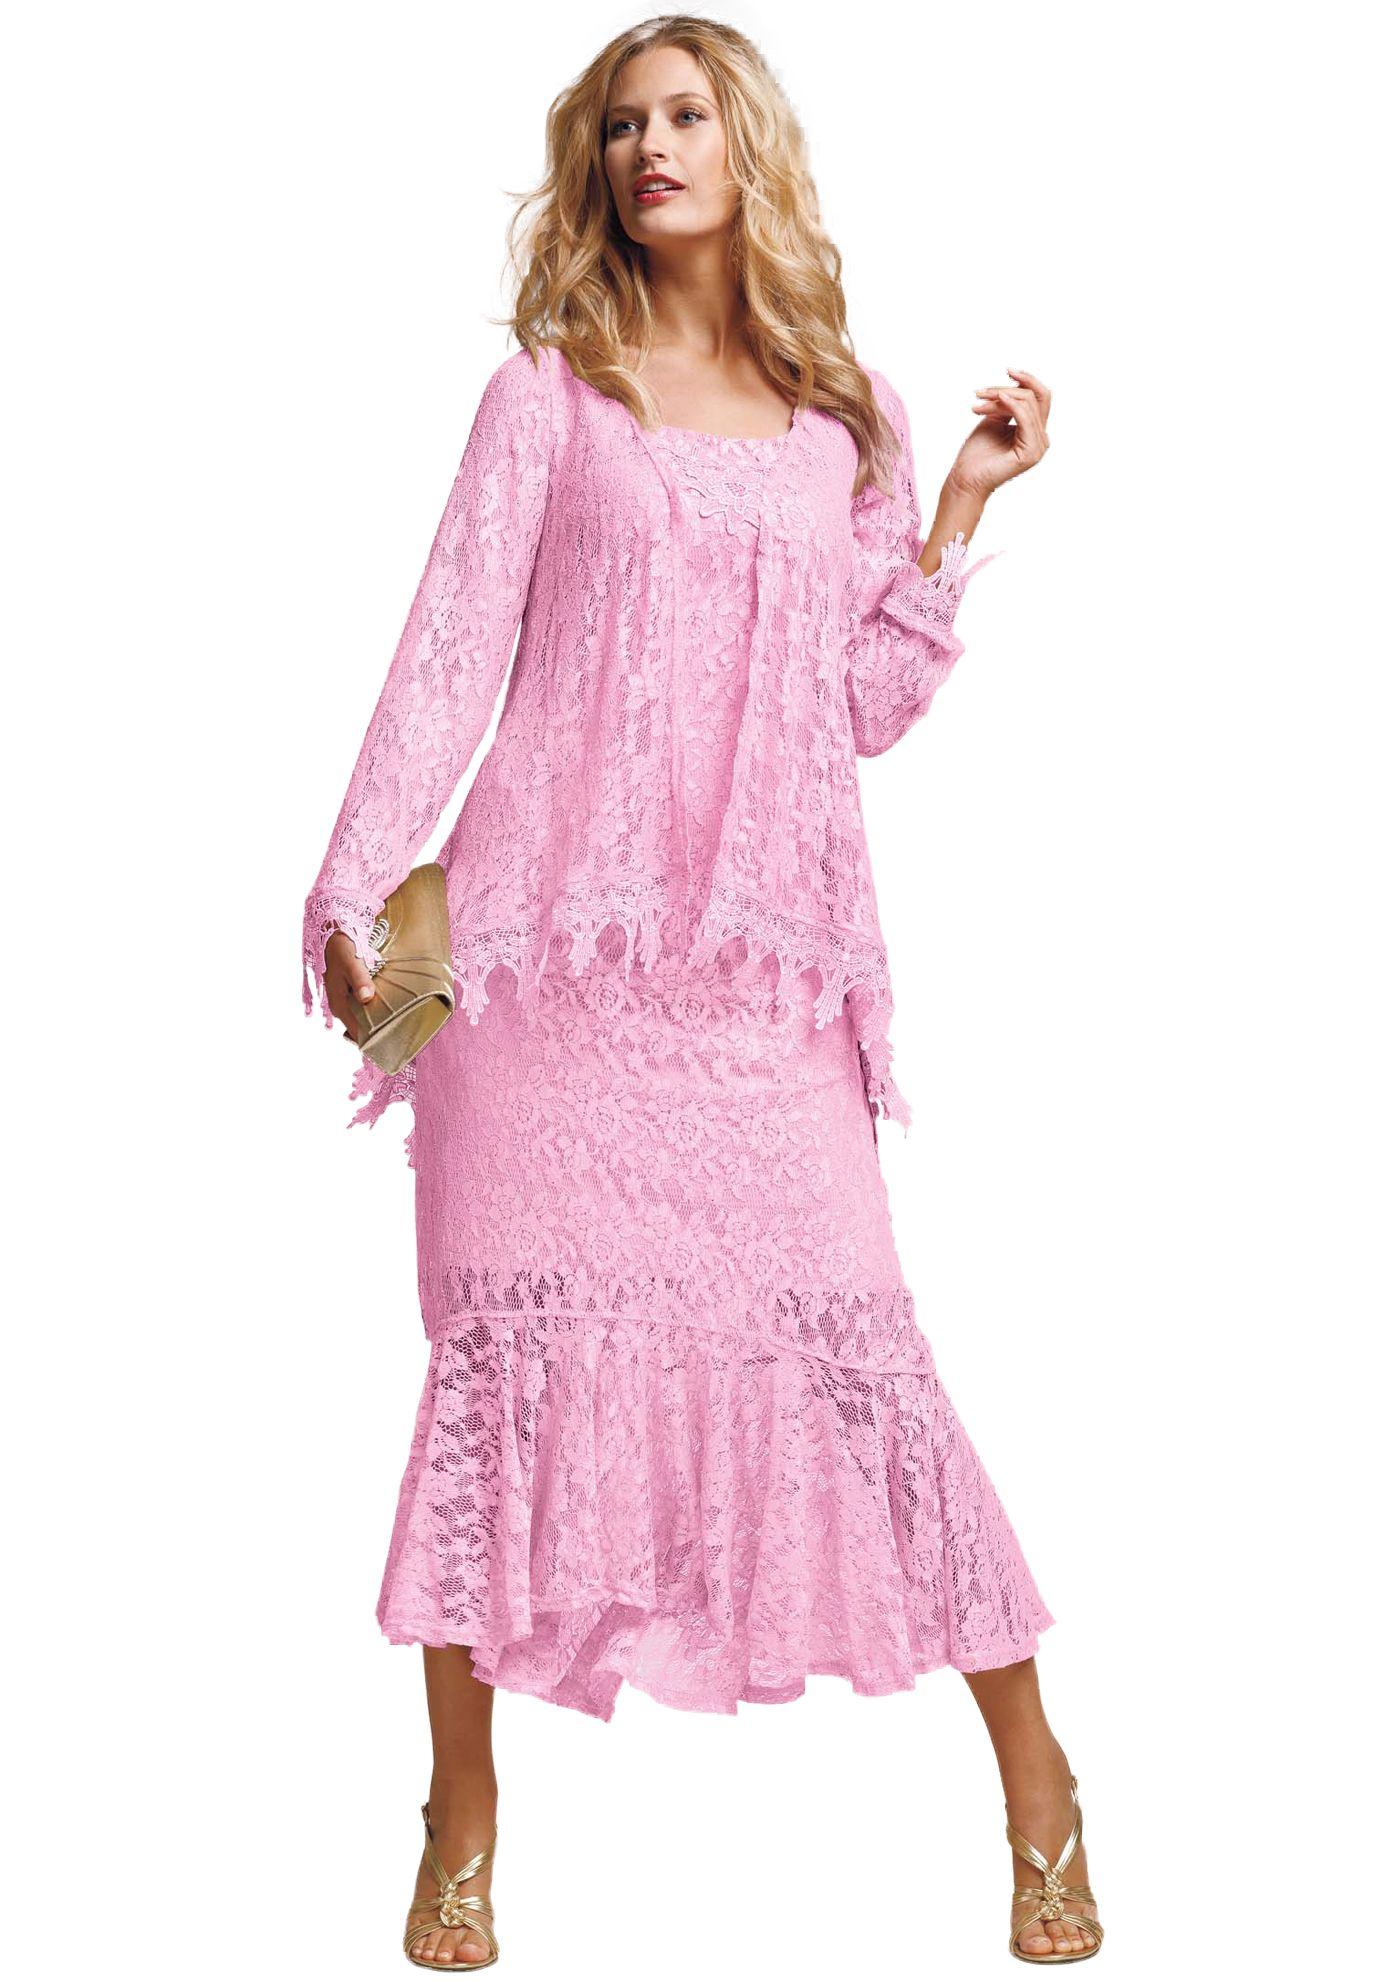 Feminine ALine Lace Jacket Dress  Plus Size Dresses and Skirts